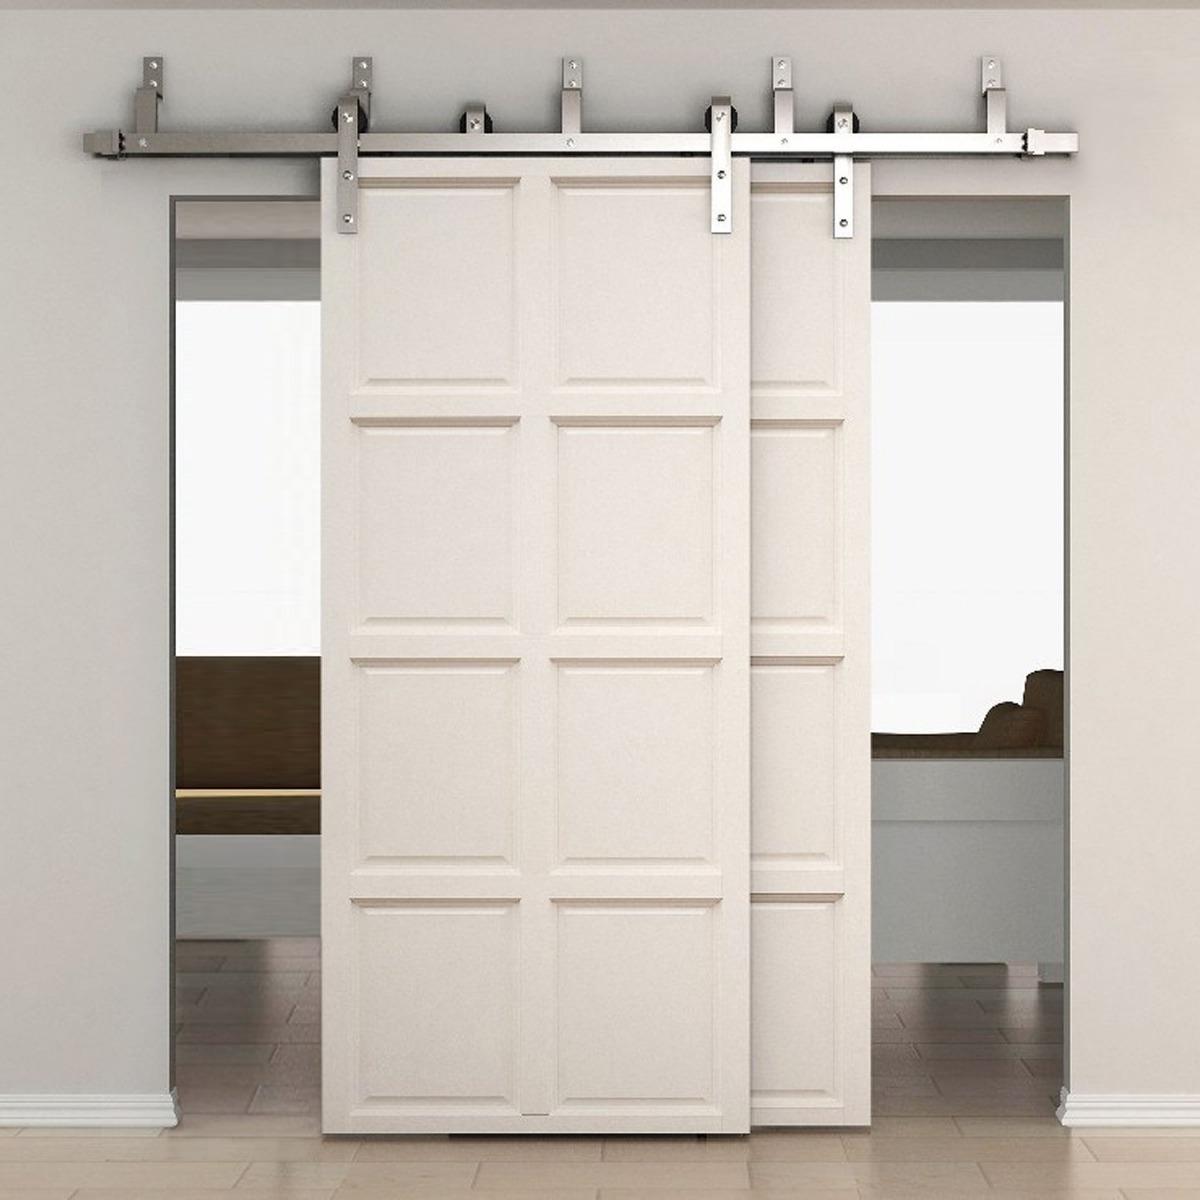 Riel para doble puerta corrediza 6pies forma j acero for Riel para puerta corrediza